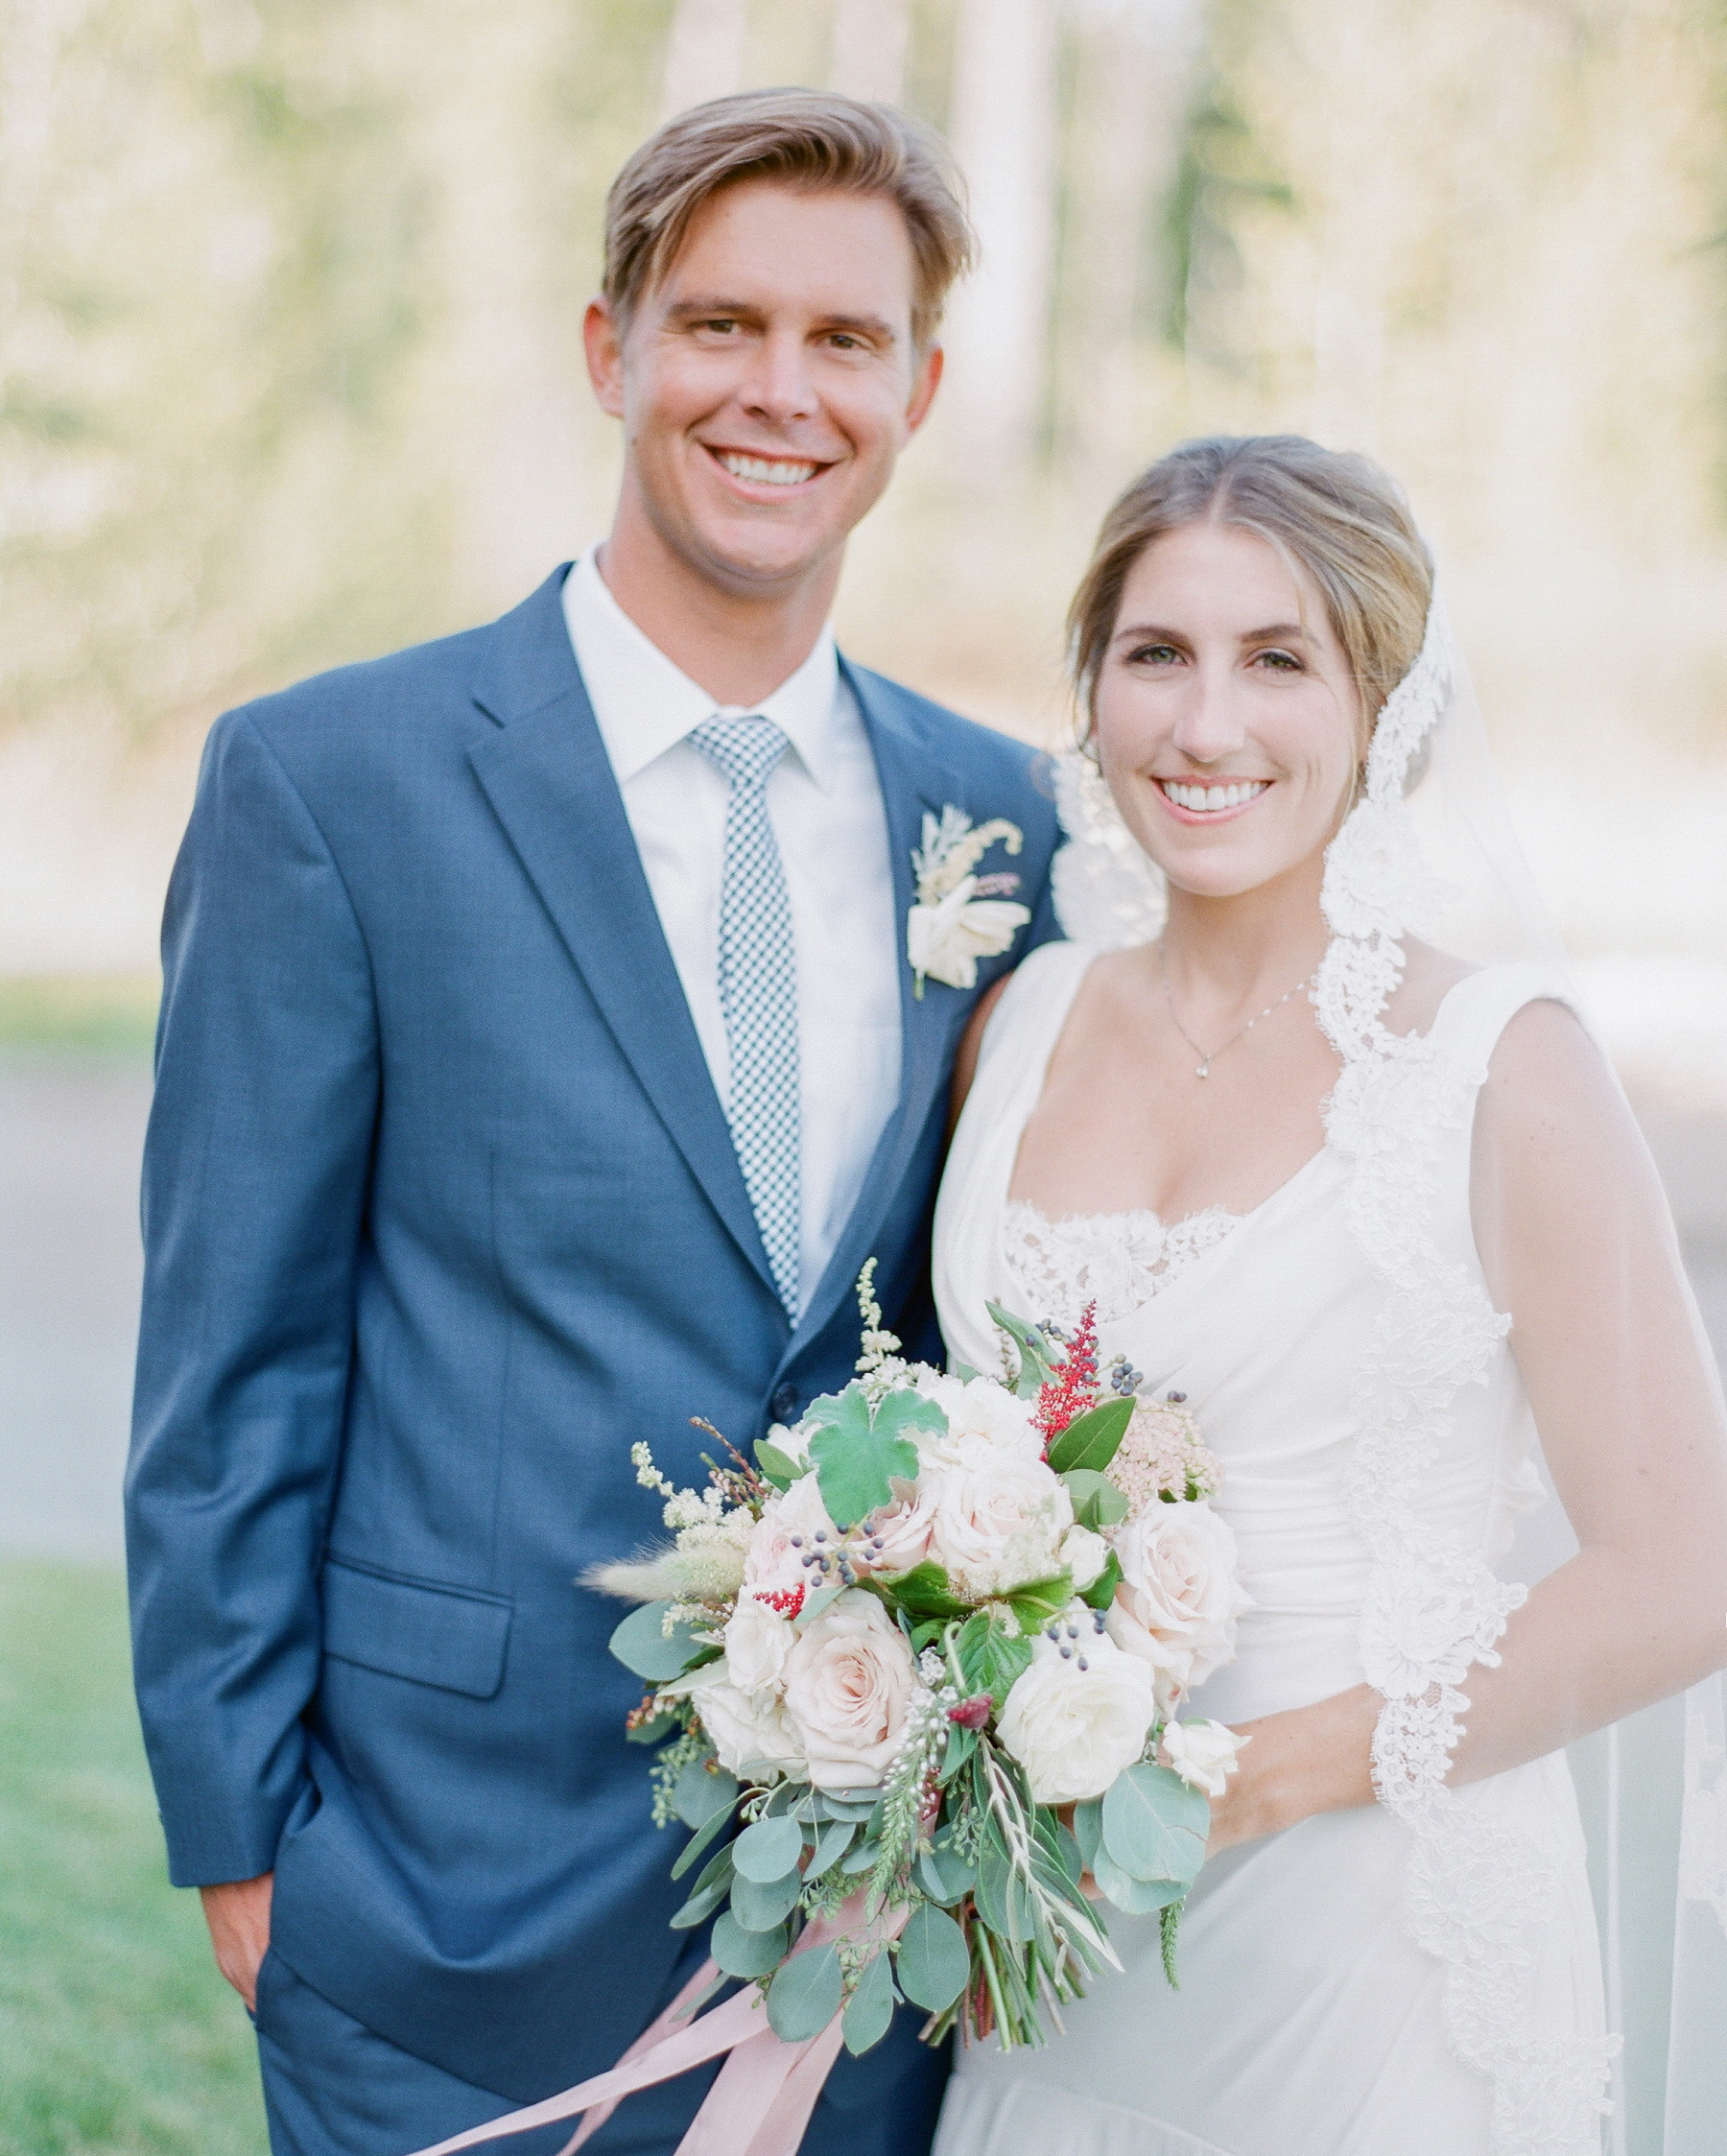 robin-kenny-wedding-couple-437-s112068-0715.jpg